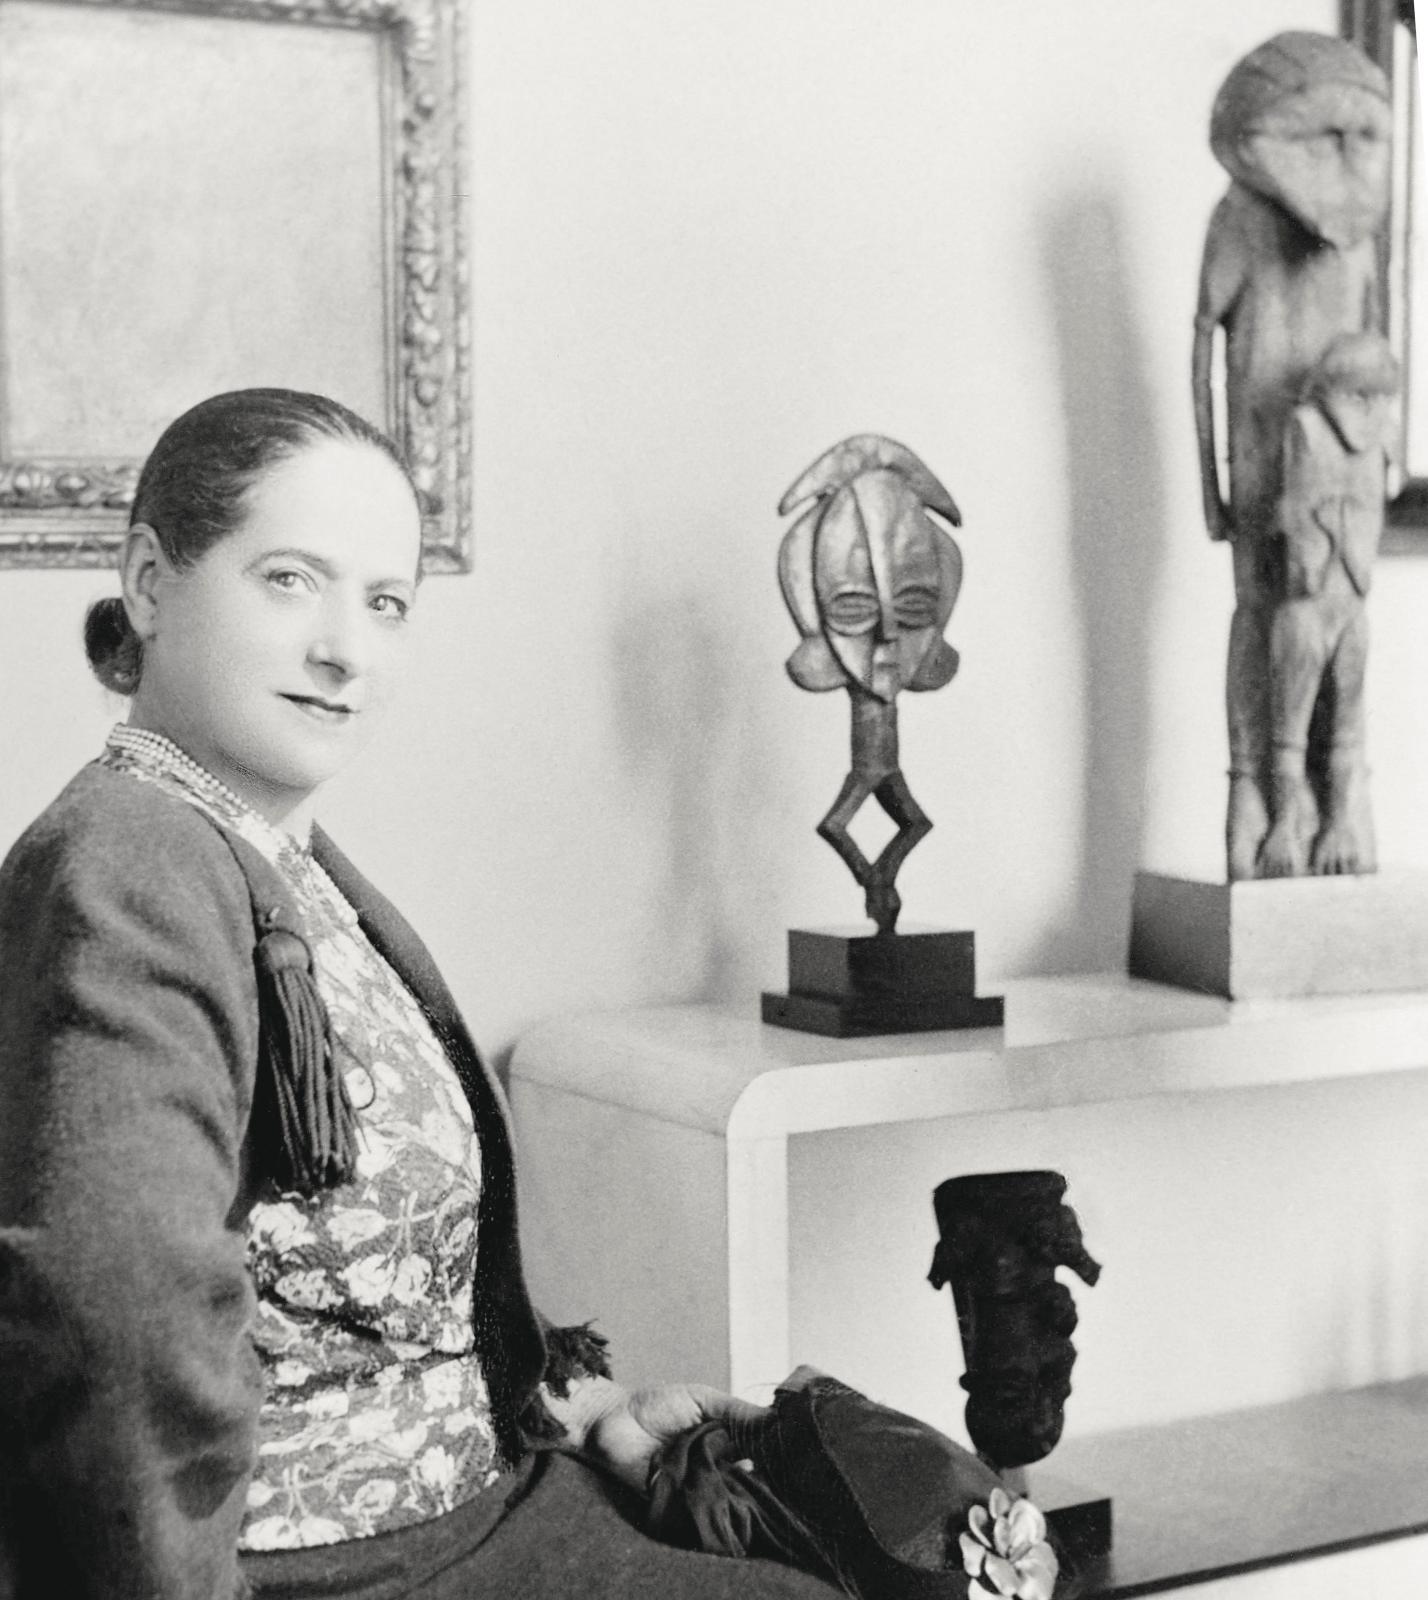 Helena Rubinstein posant devant des objets de sa collection, 216, boulevard Raspail, Paris, vers1930. © Studio Lipnitzki/Roger-Viollet